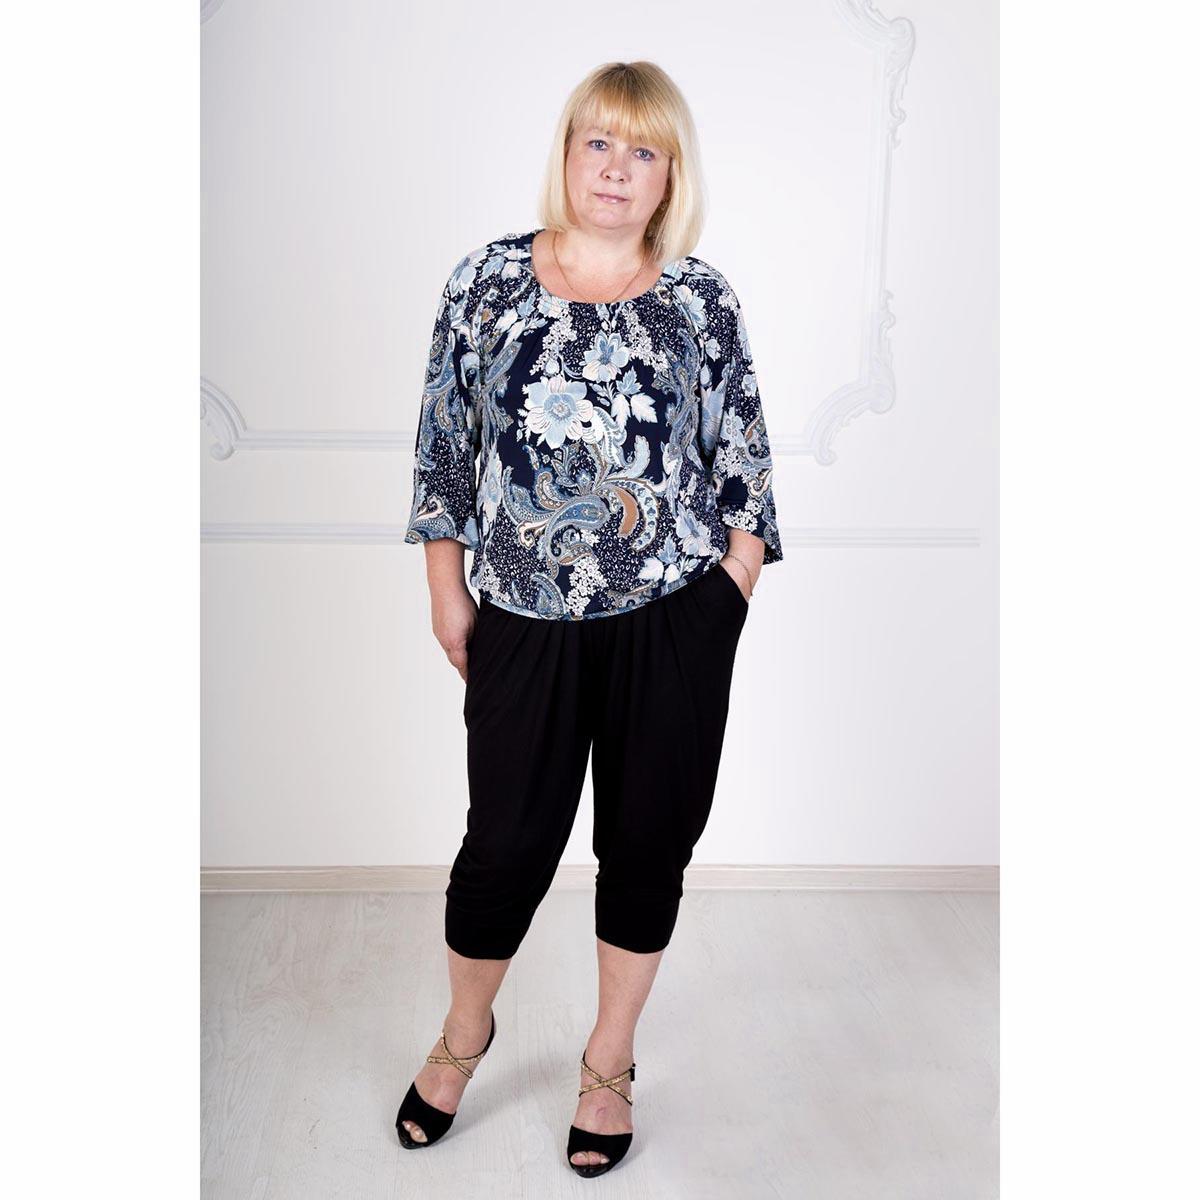 Женская блуза Ильда, размер 60Блузки, майки, кофты<br>Обхват груди:120 см<br>Обхват талии:101 см<br>Обхват бедер:128 см<br>Рост:167 см<br><br>Тип: Жен. блуза<br>Размер: 60<br>Материал: Масло